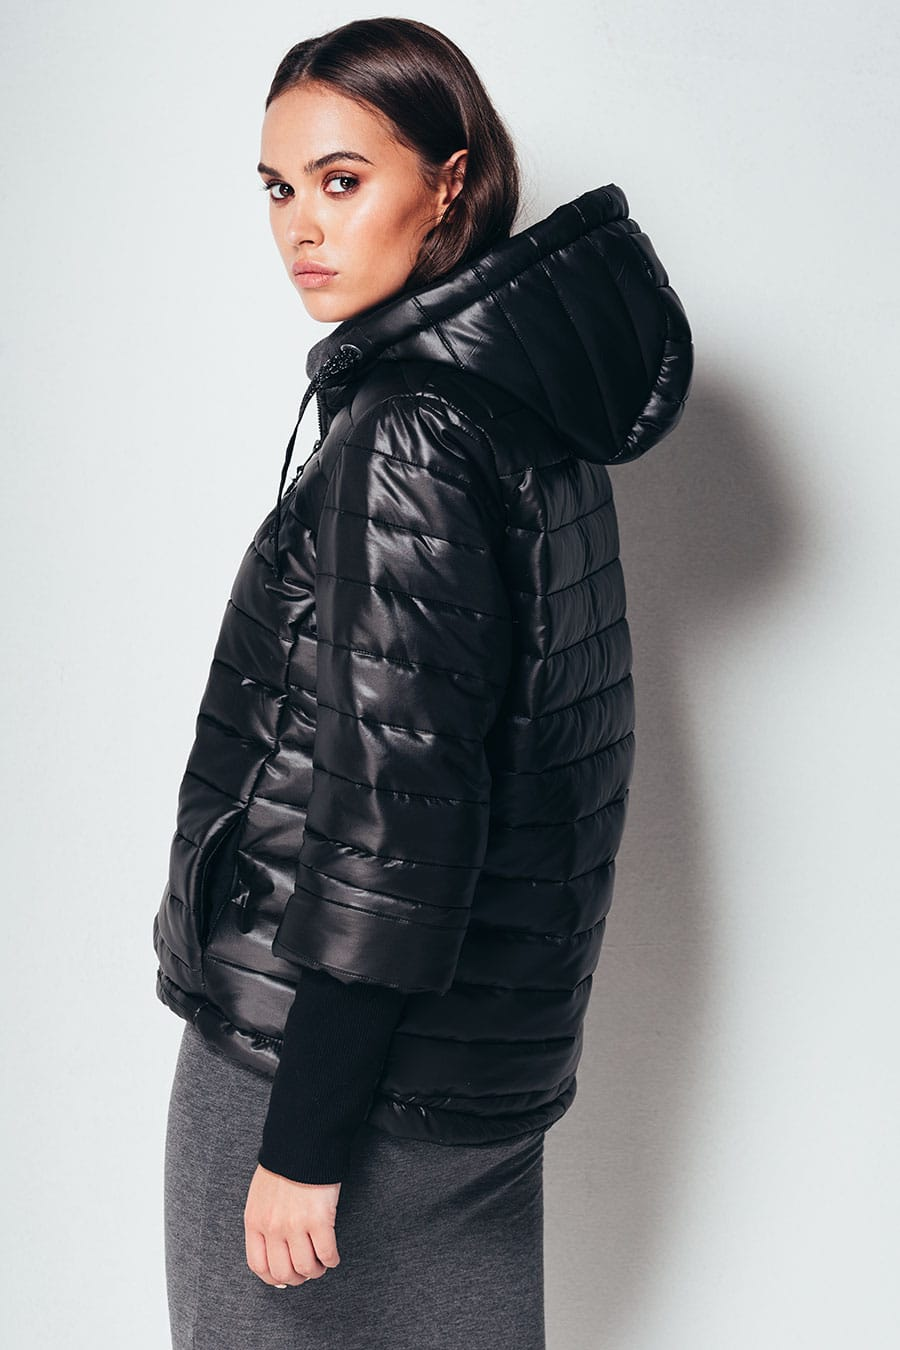 jagger internet prodavnica kolekcija jesen zima 2021 zenska jakna jg 6232 01 4